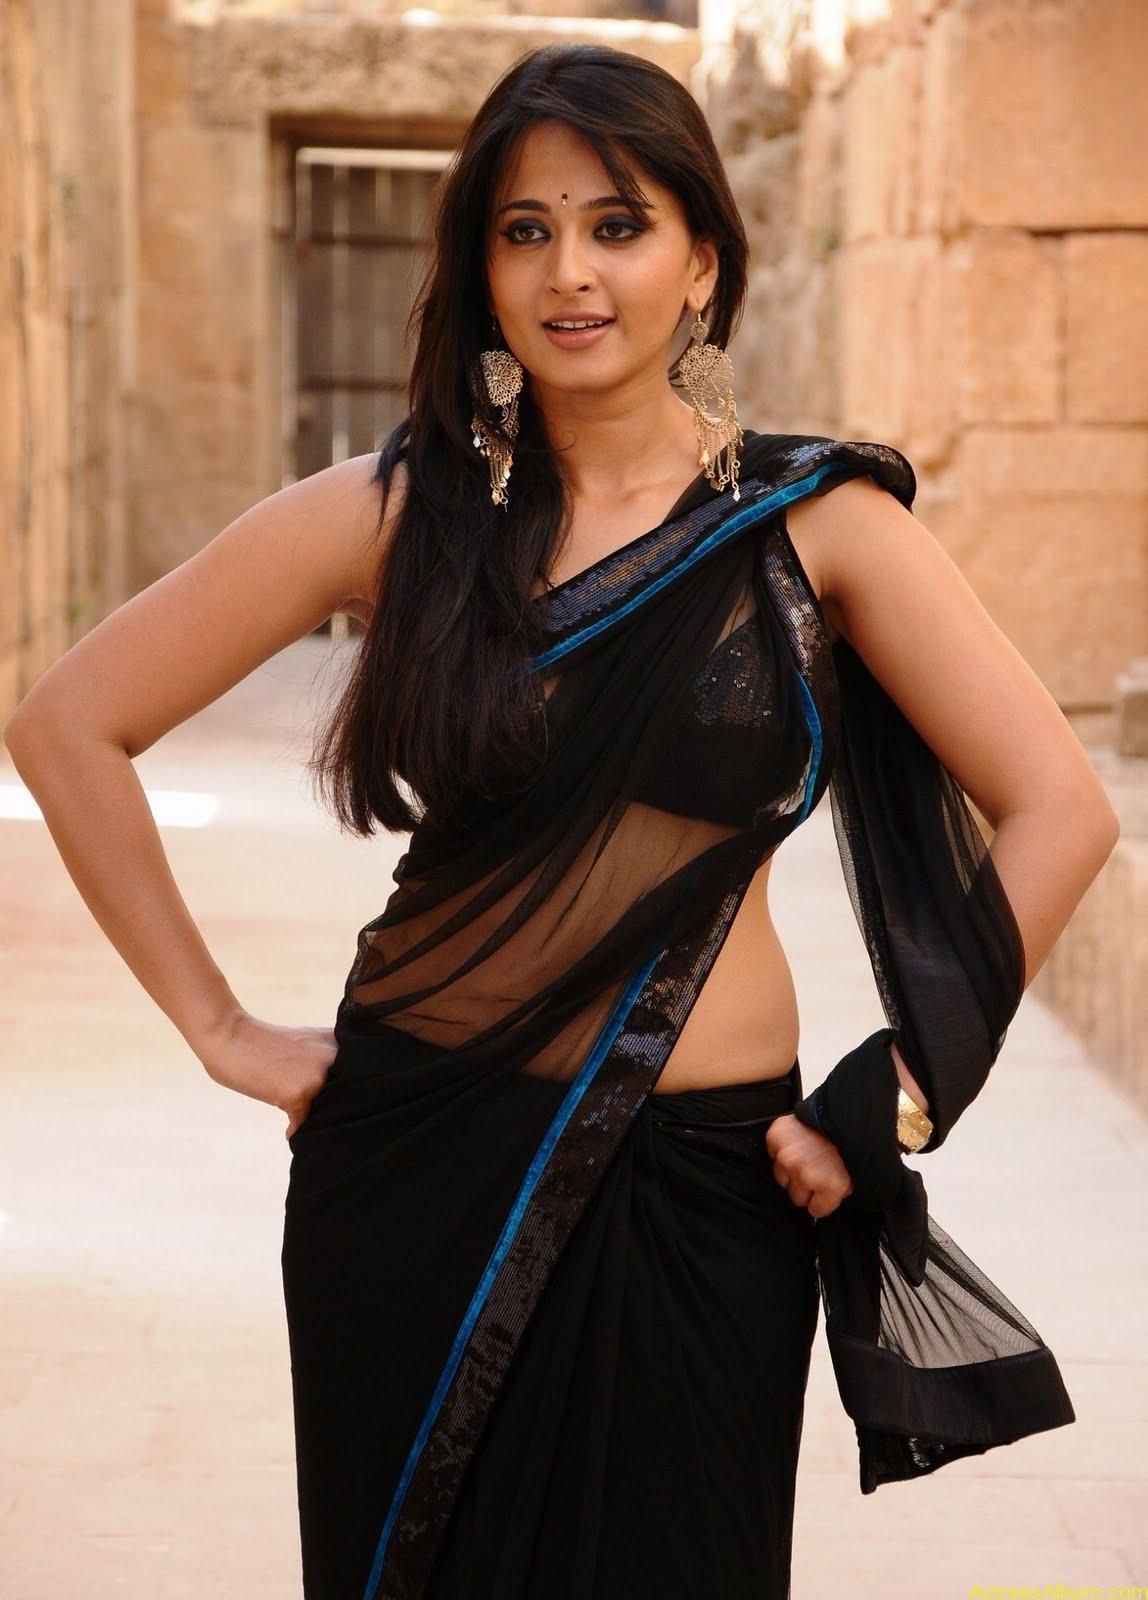 AtoZ hotphotos: Anushka Shetty hot stills in saree